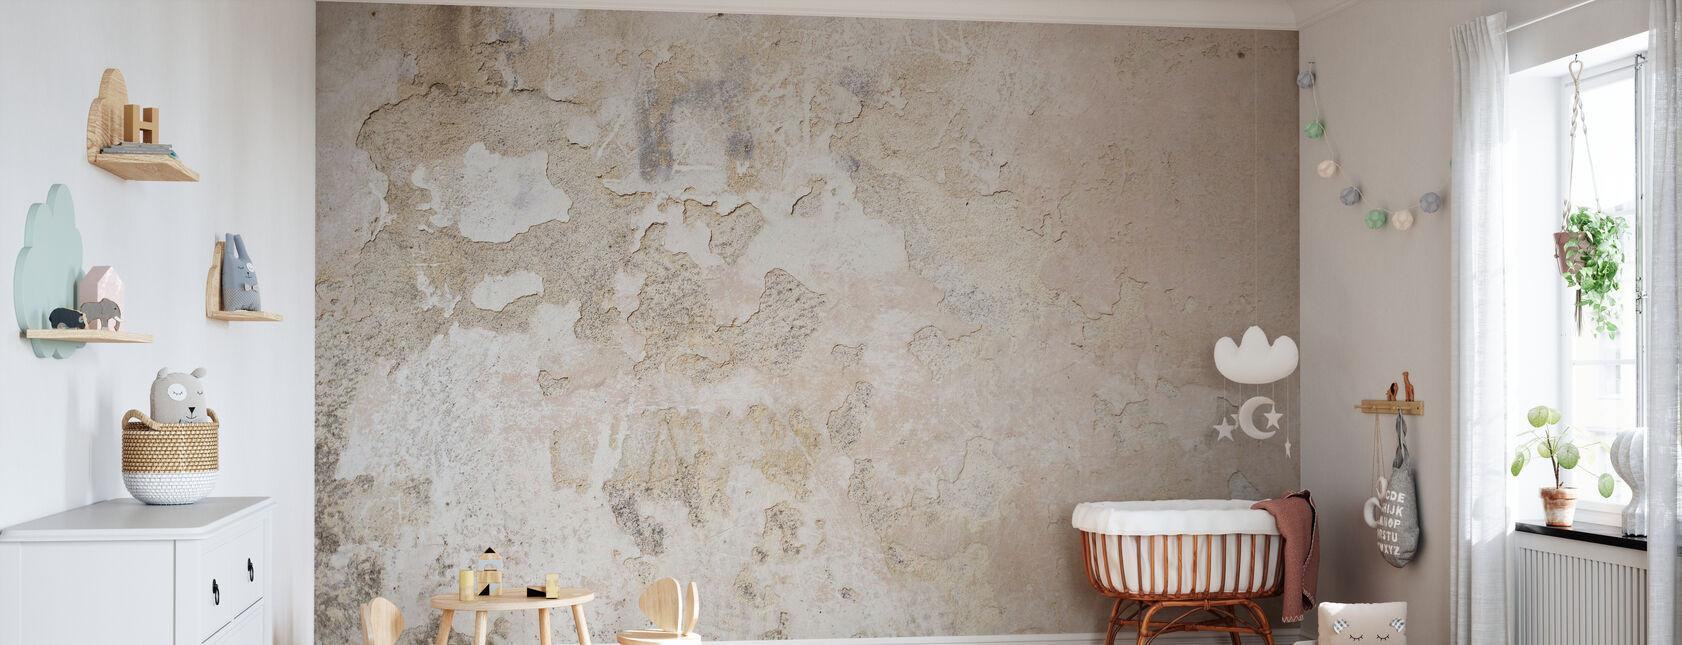 Light Street Wall - Wallpaper - Nursery